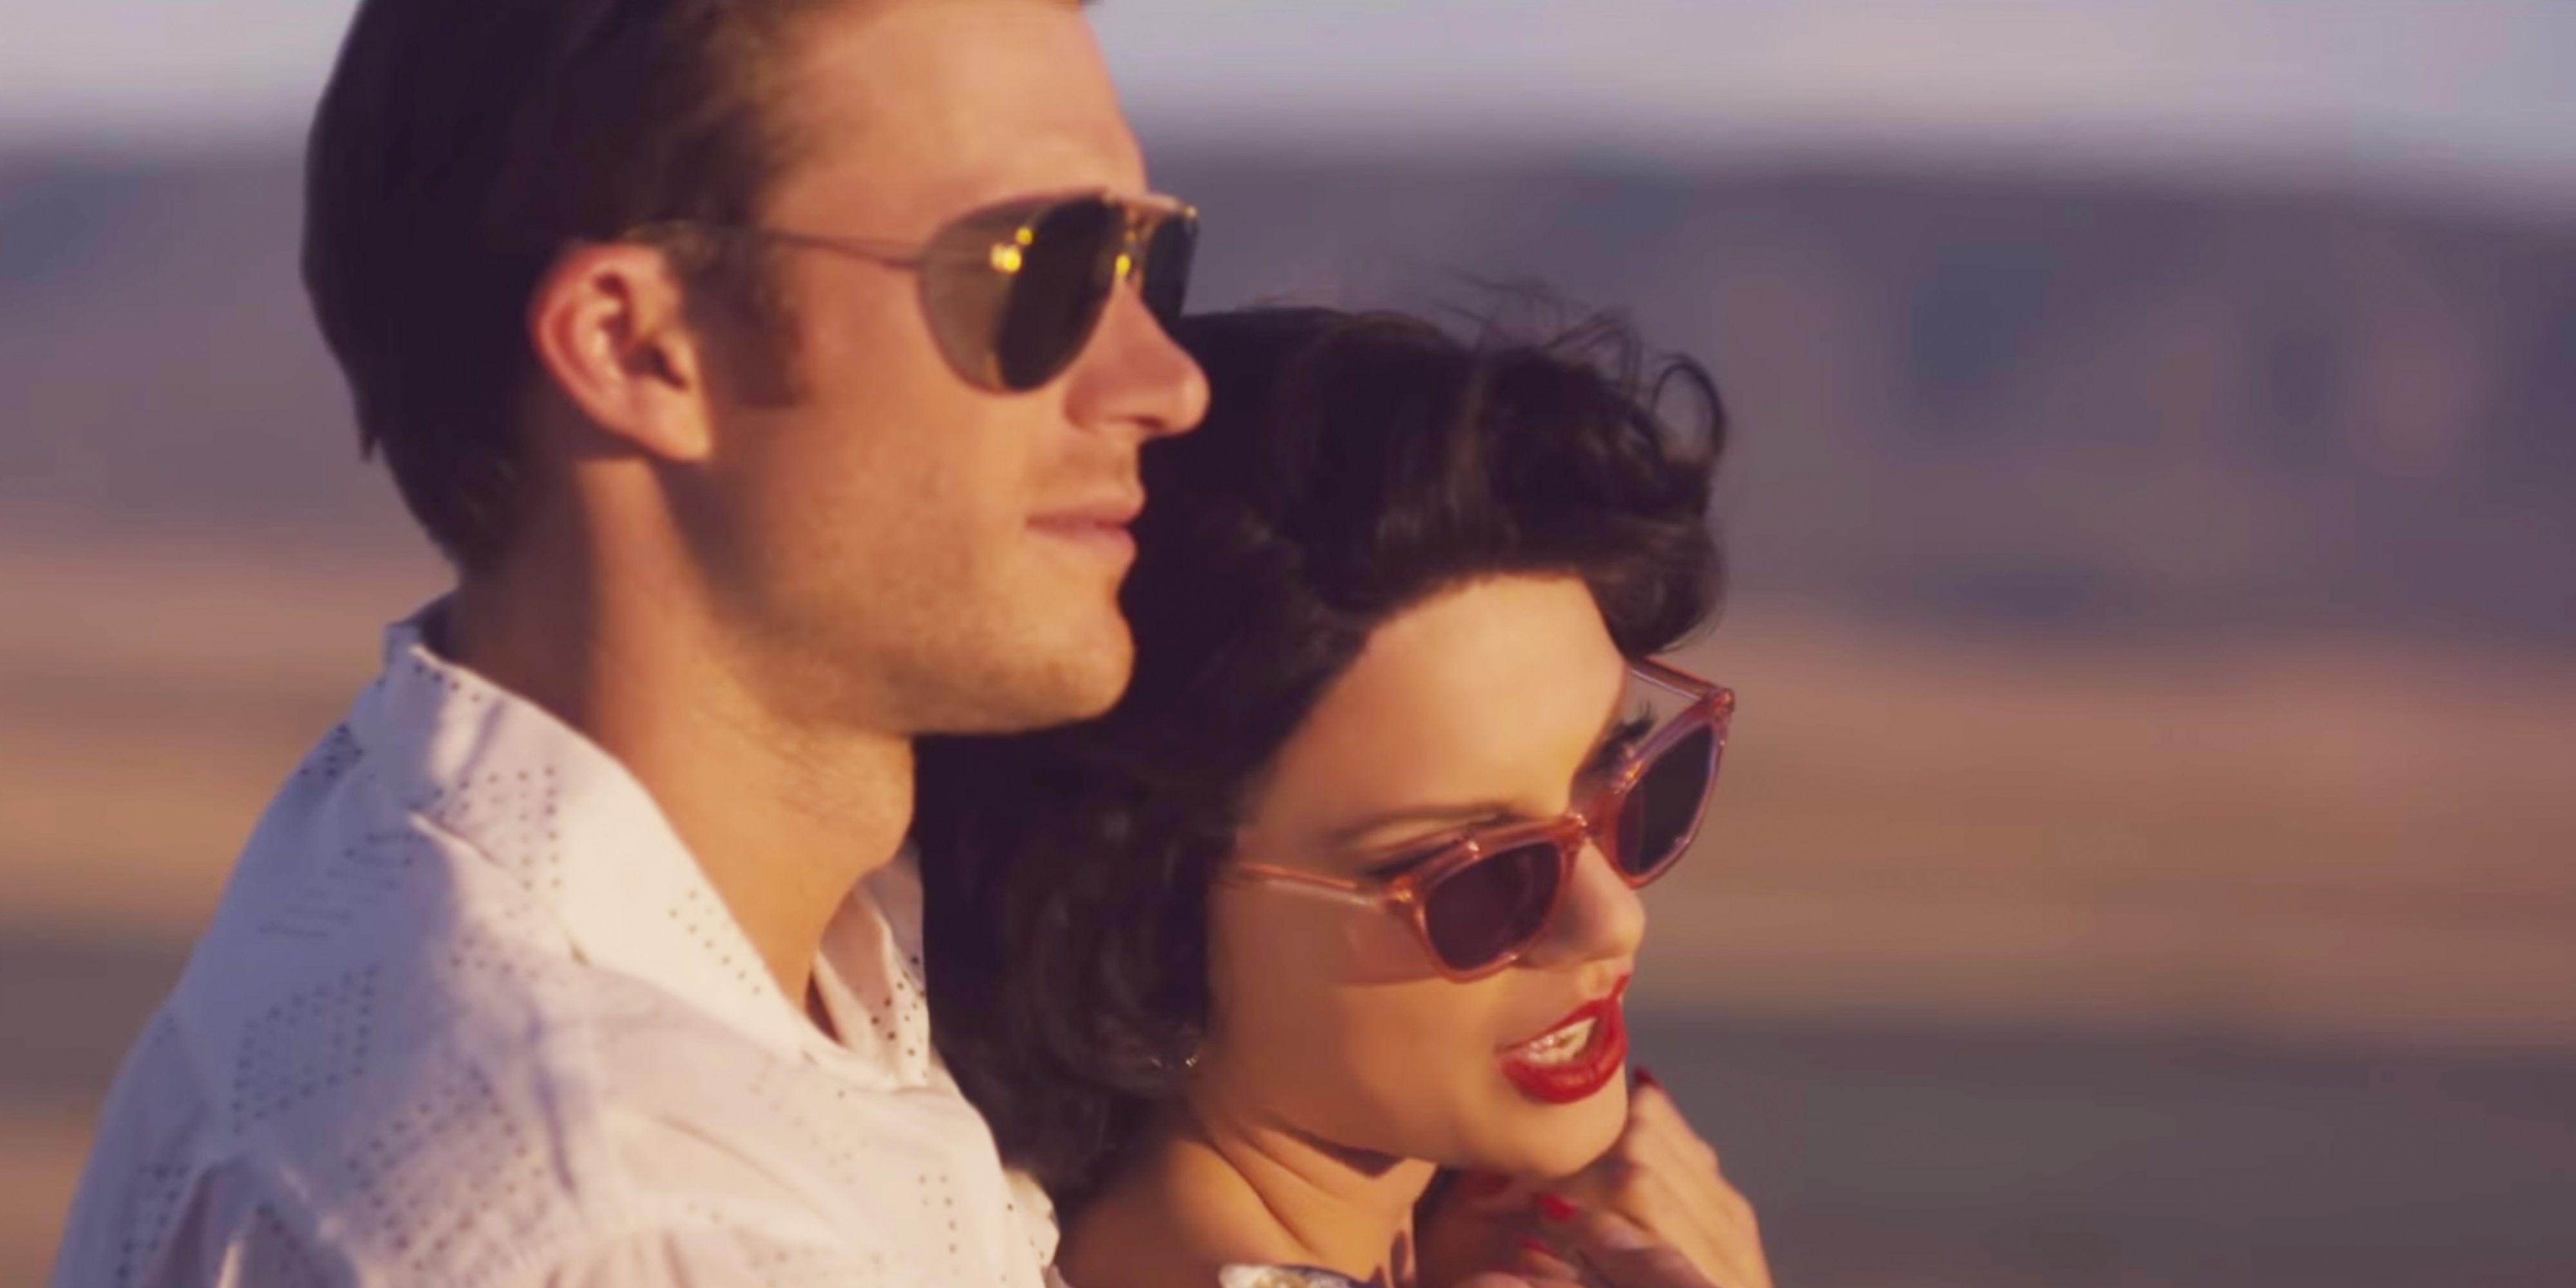 Taylor Swift Wildest Dreams Music Video